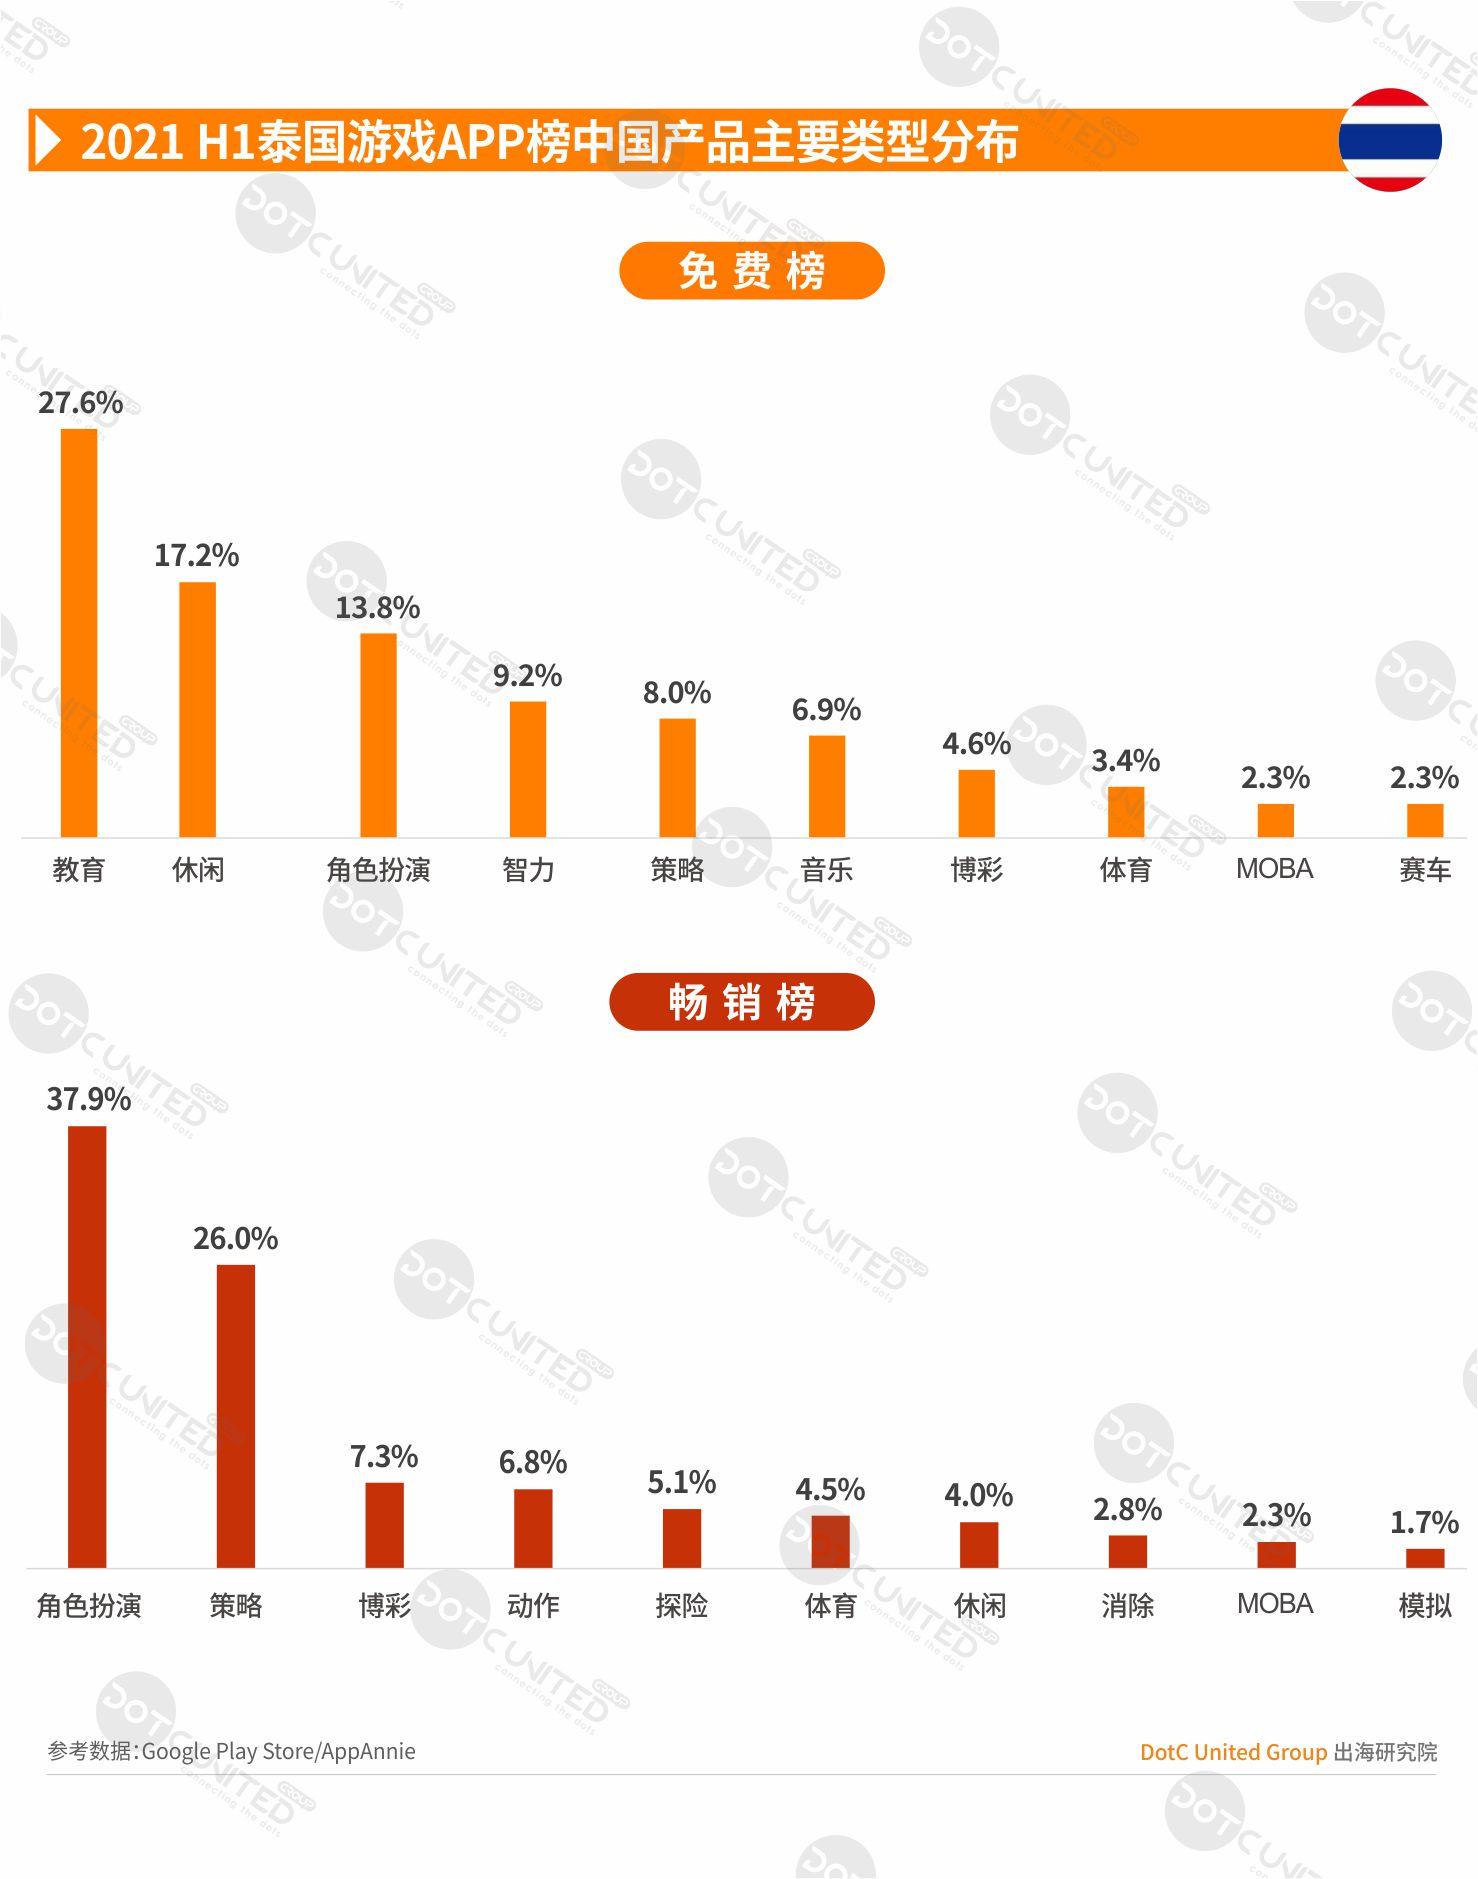 2021 H1 中国APP出海启示录—泰国-Gamewower